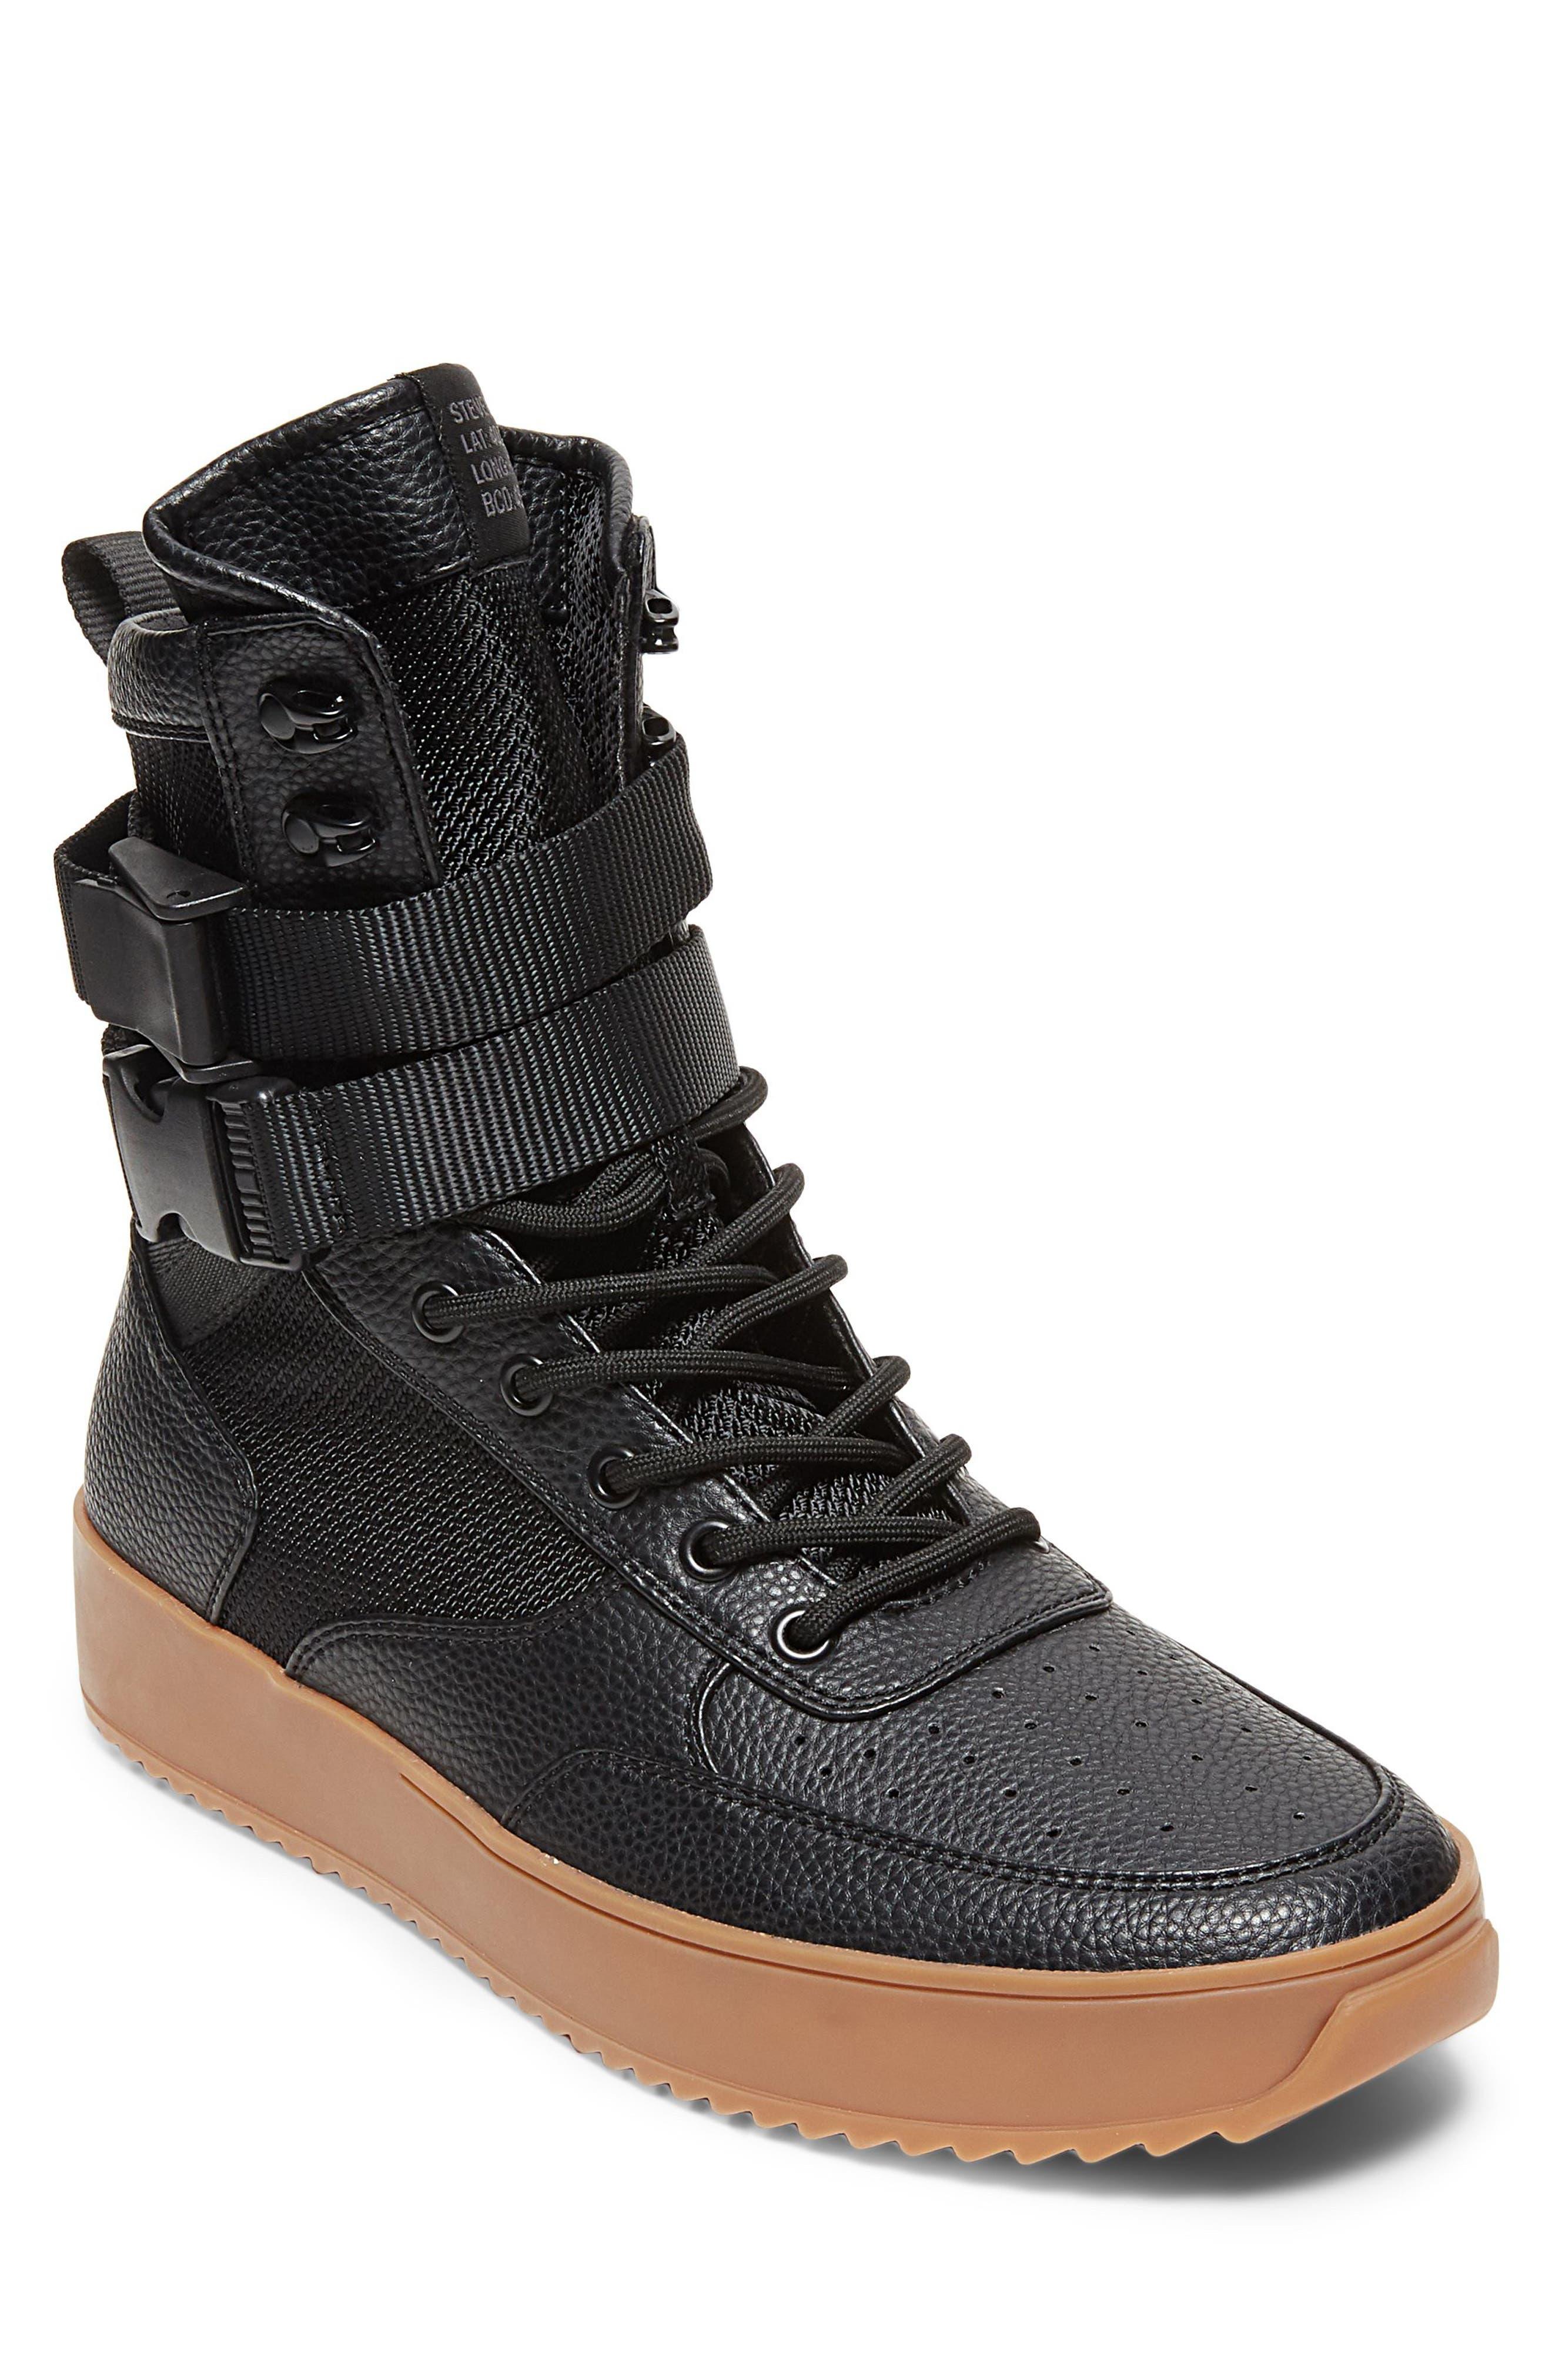 Zeroday Sneaker,                             Main thumbnail 1, color,